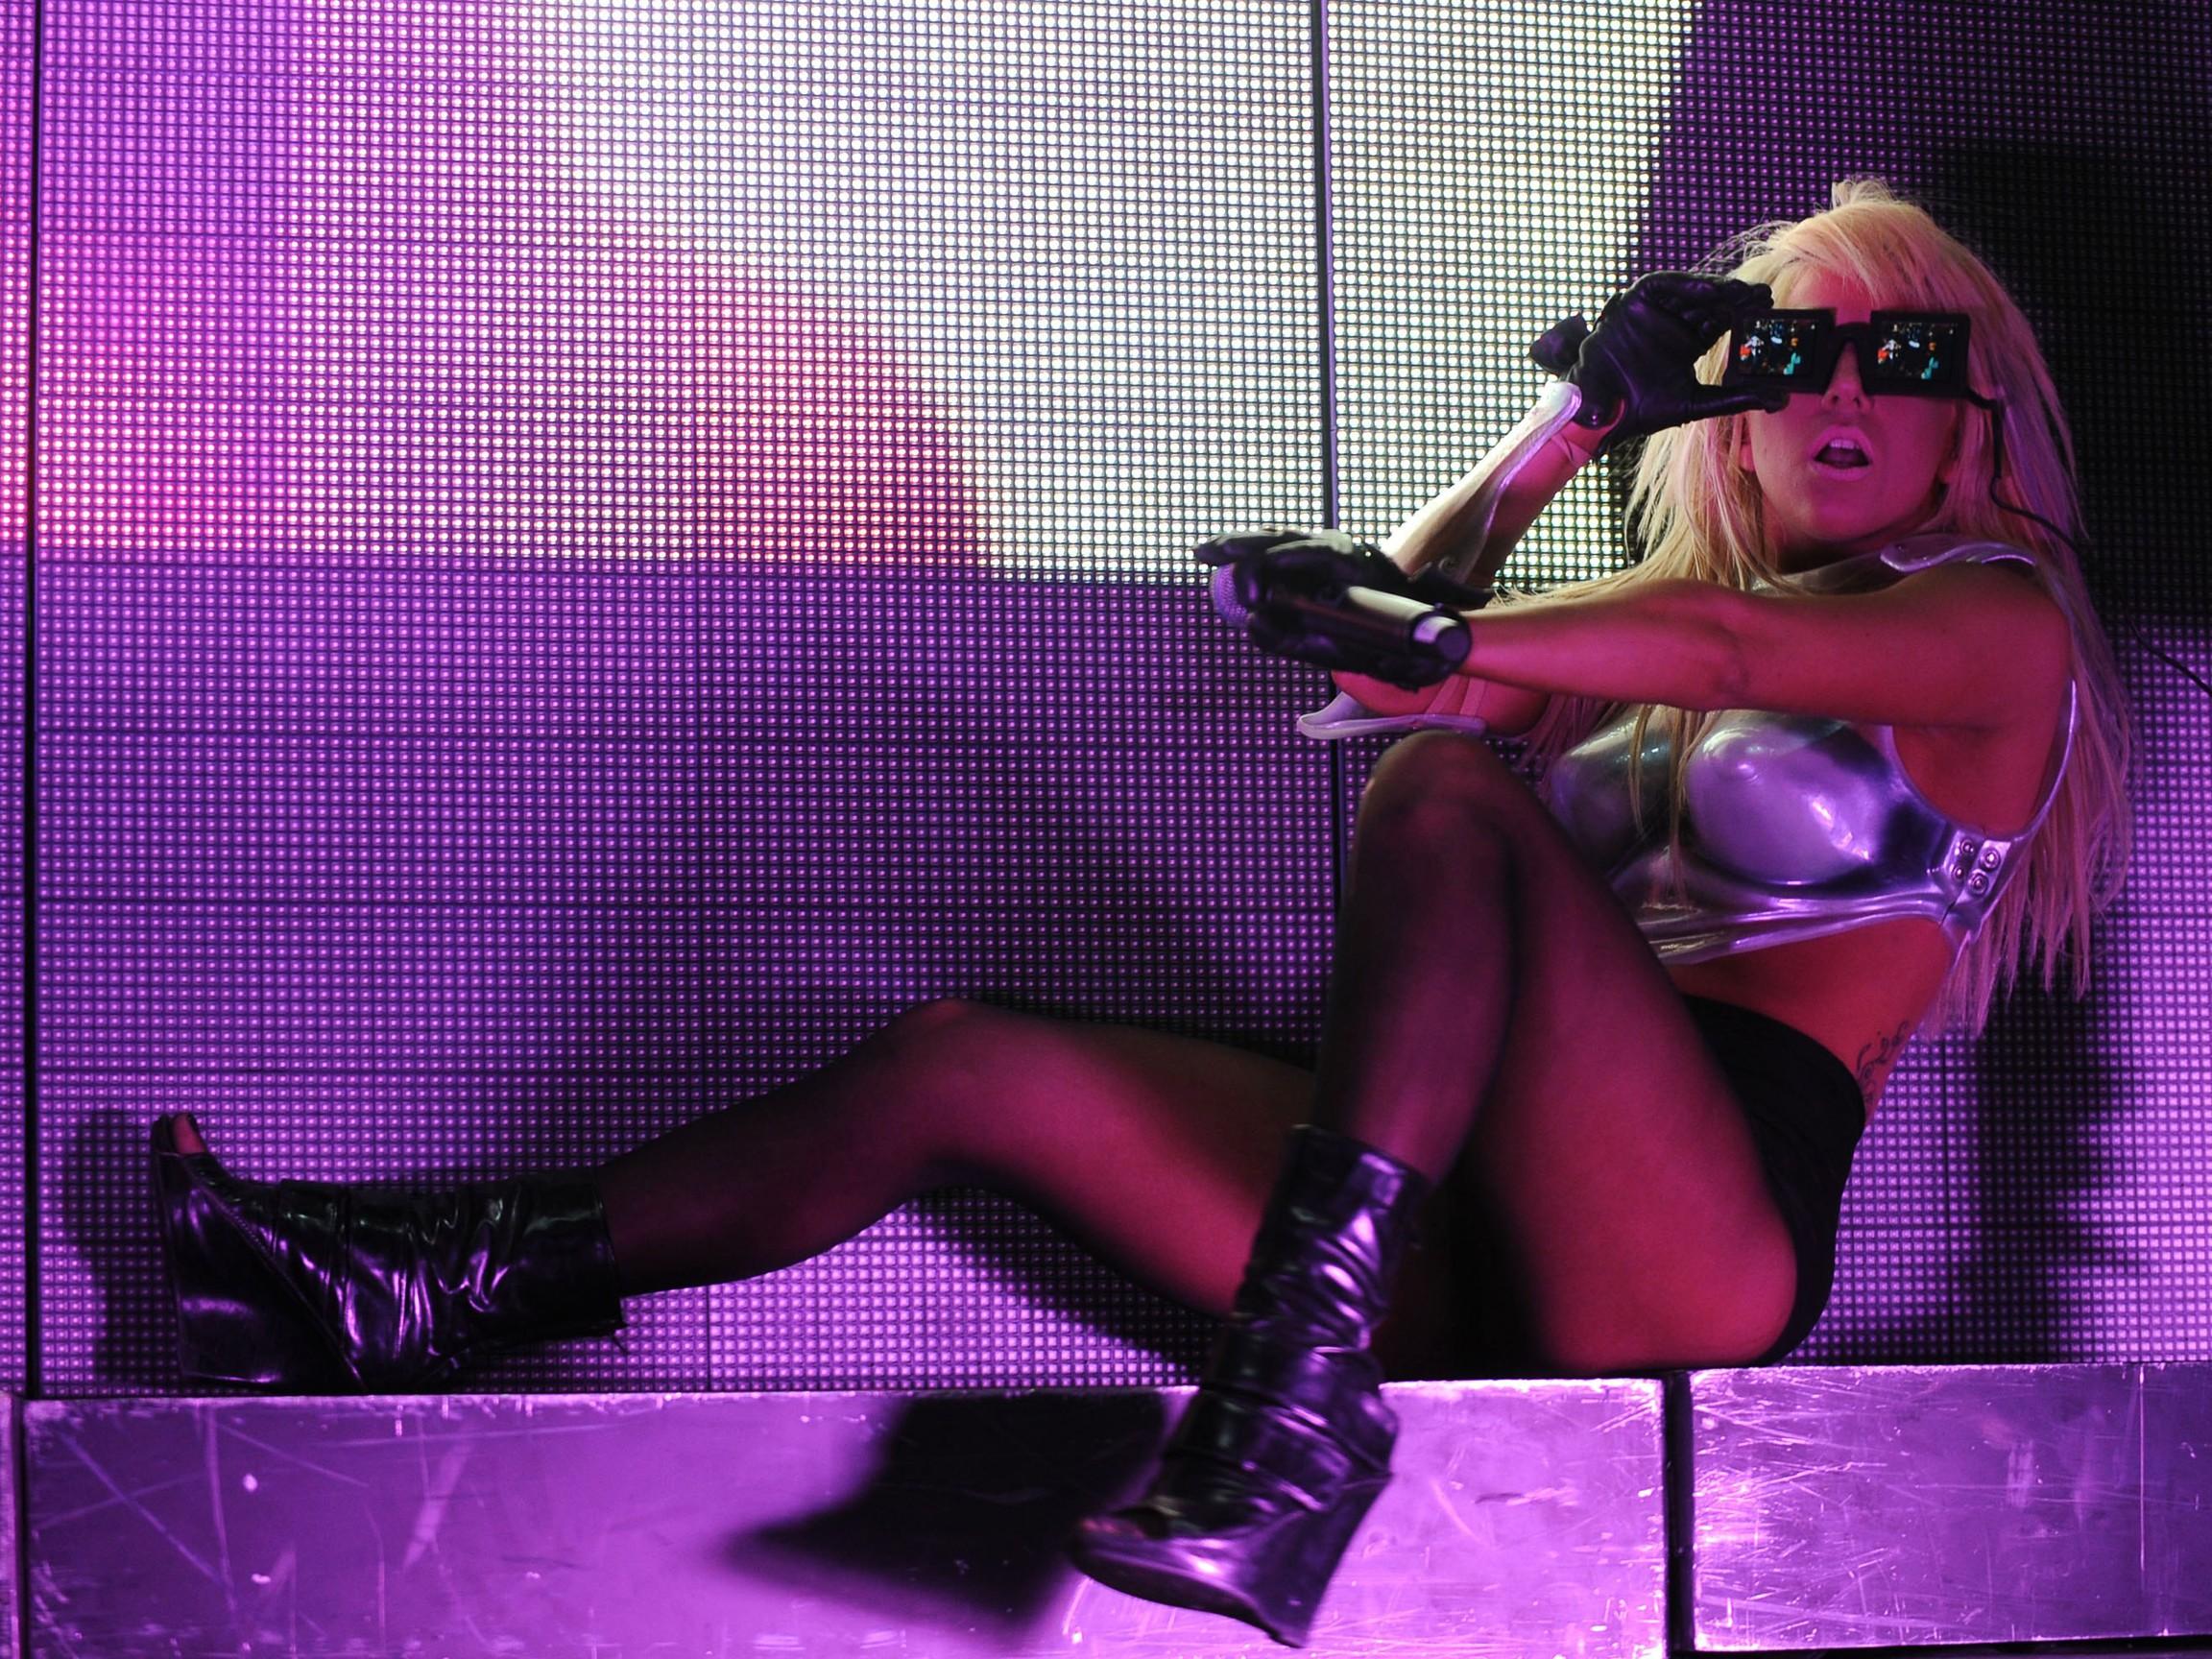 Wallpaper: Lady GaGa durante uno show